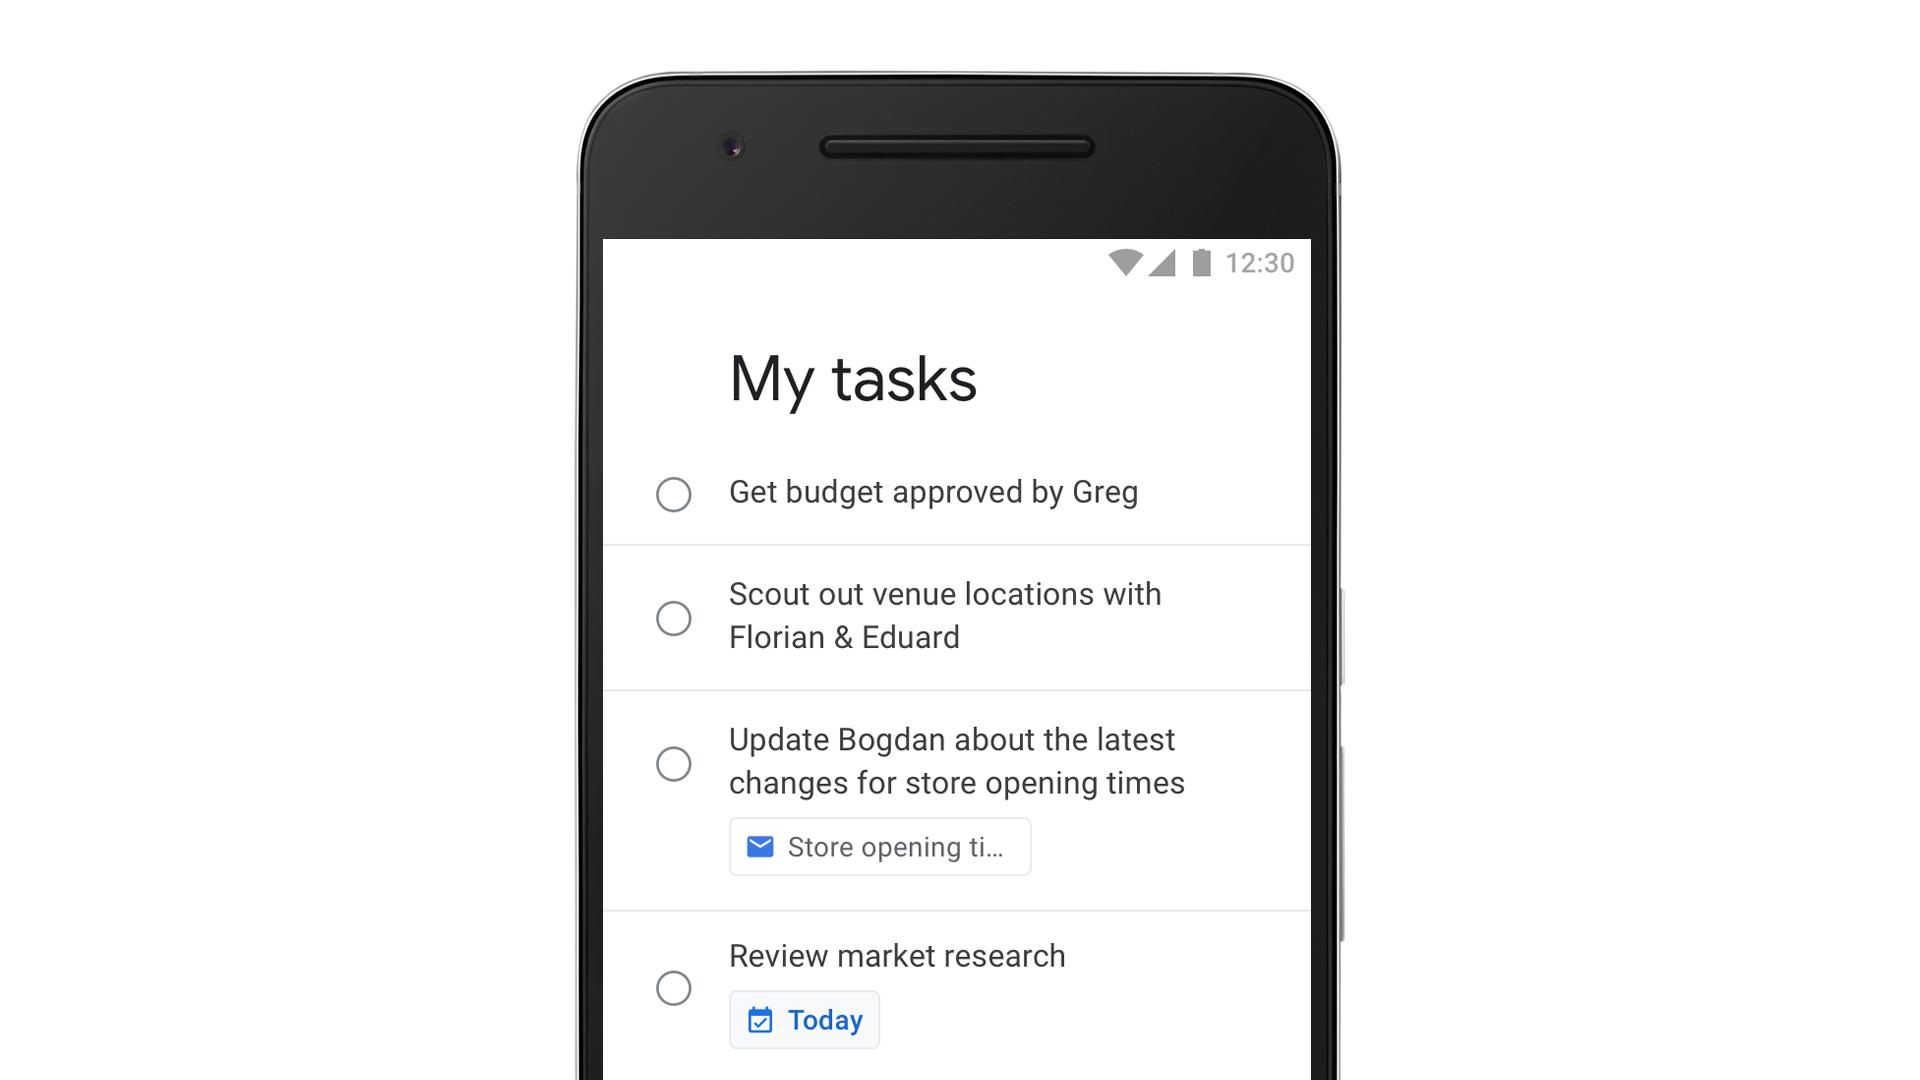 Google is finally making a standalone Tasks app